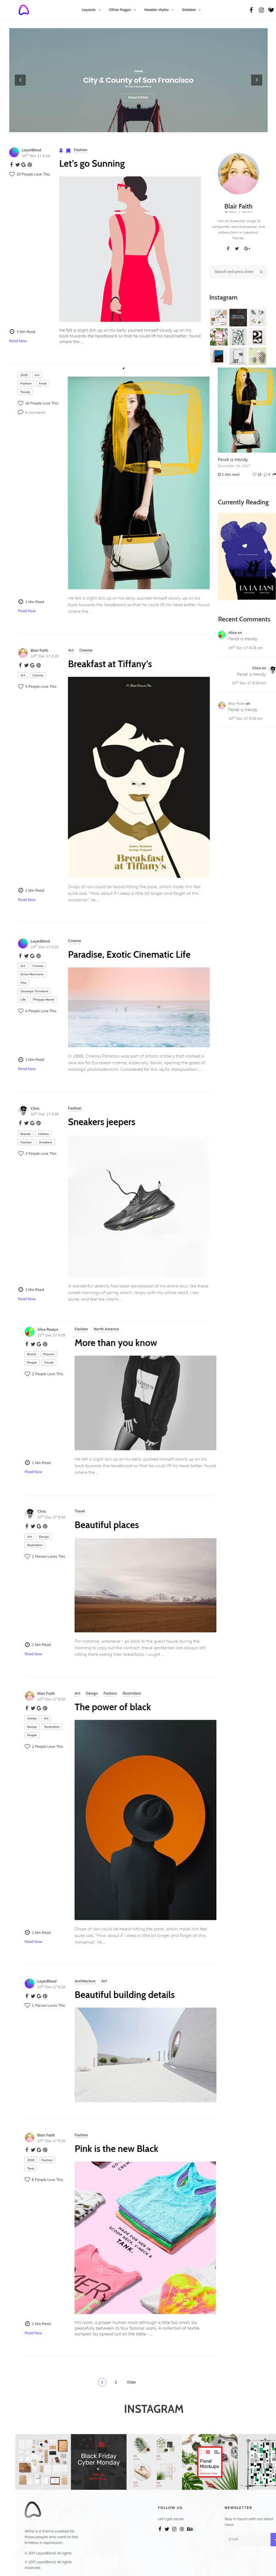 Alimo - Clean Responsive WordPress Blog Theme